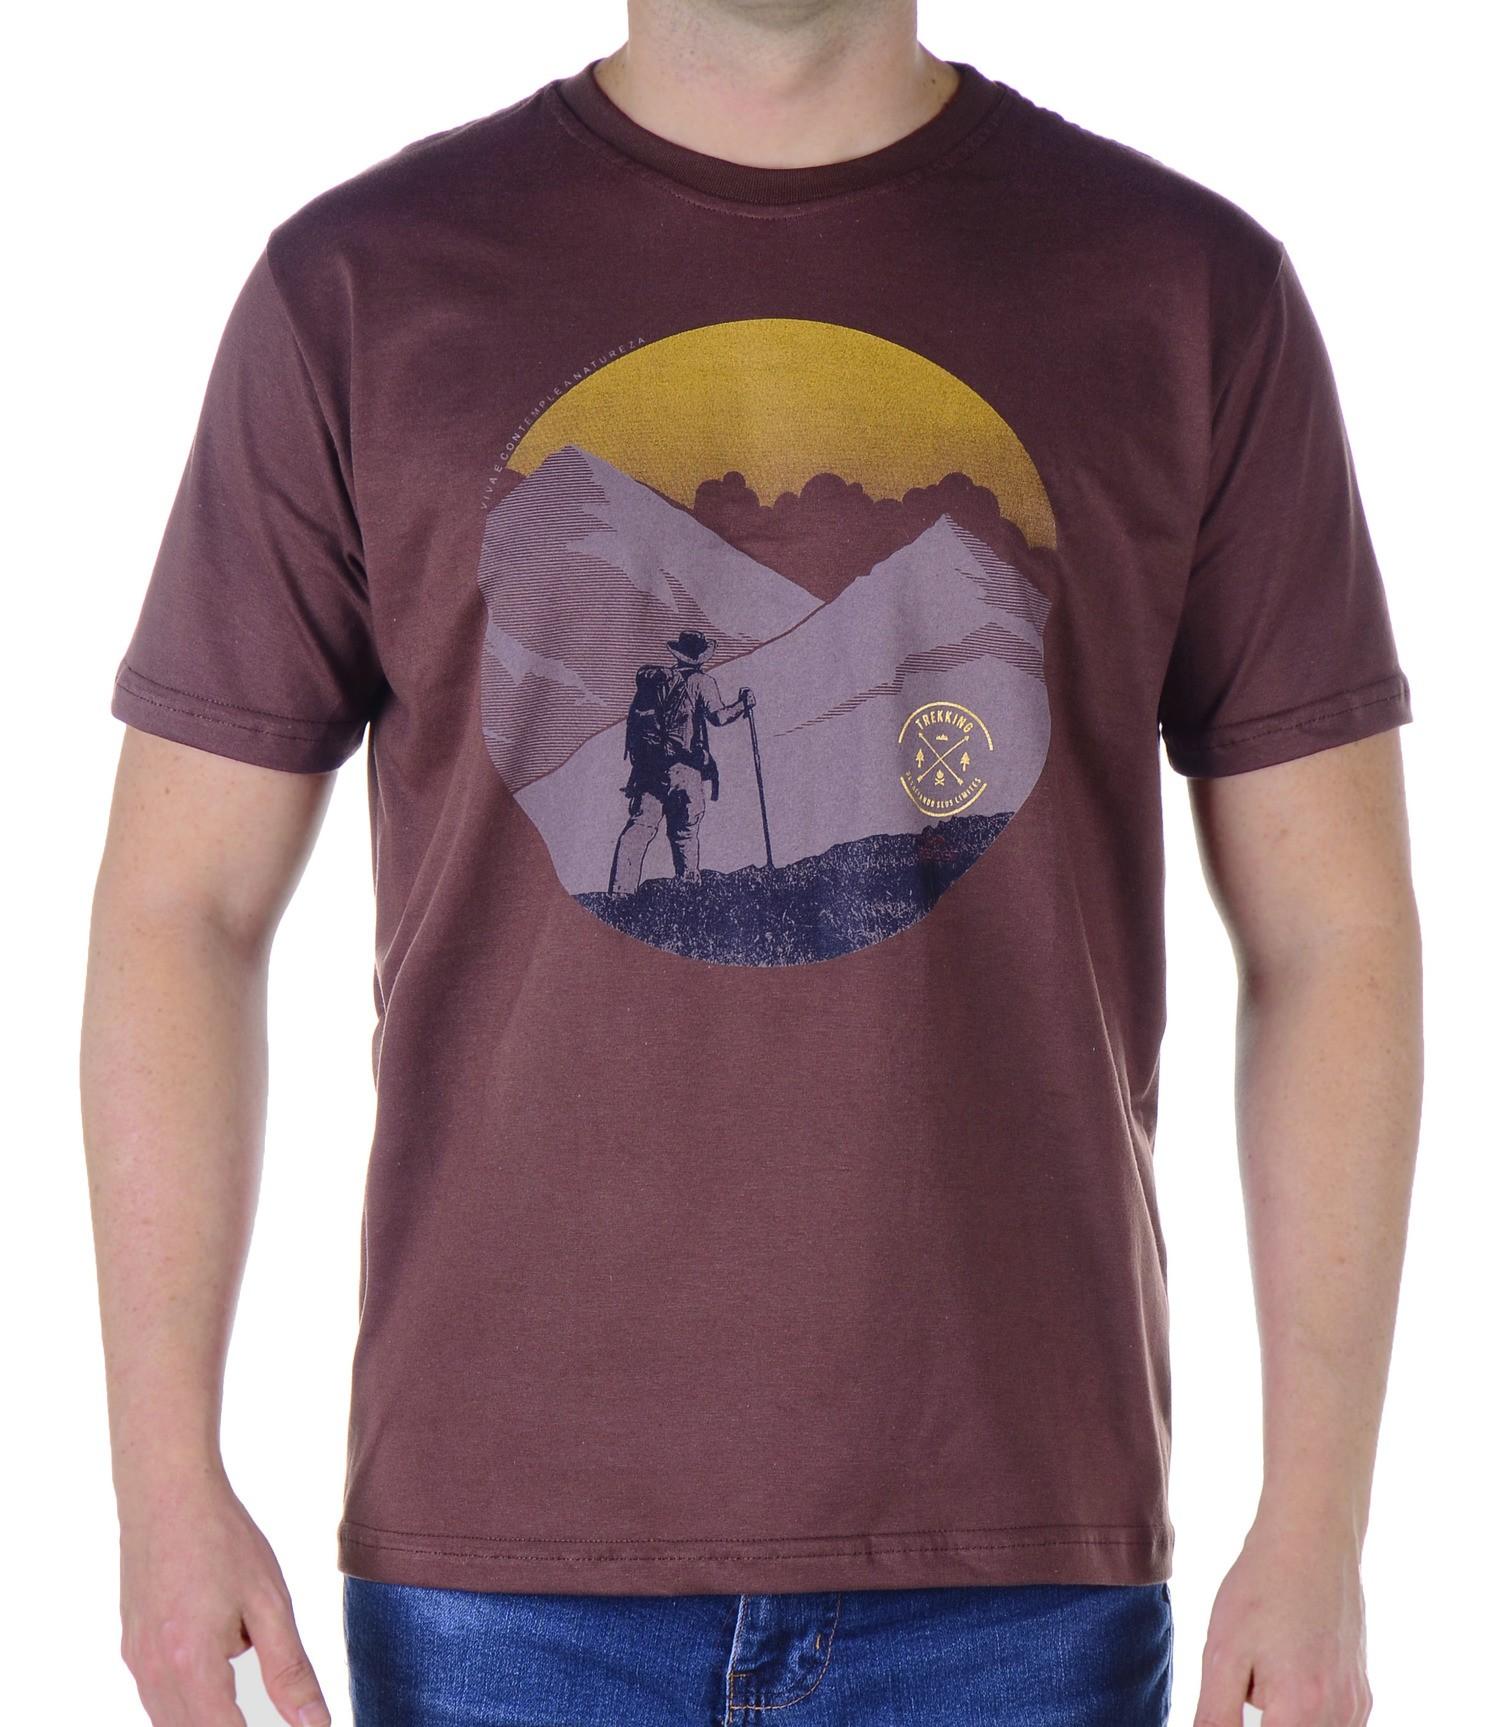 Camiseta Masculina Revost Trekking - Marrom